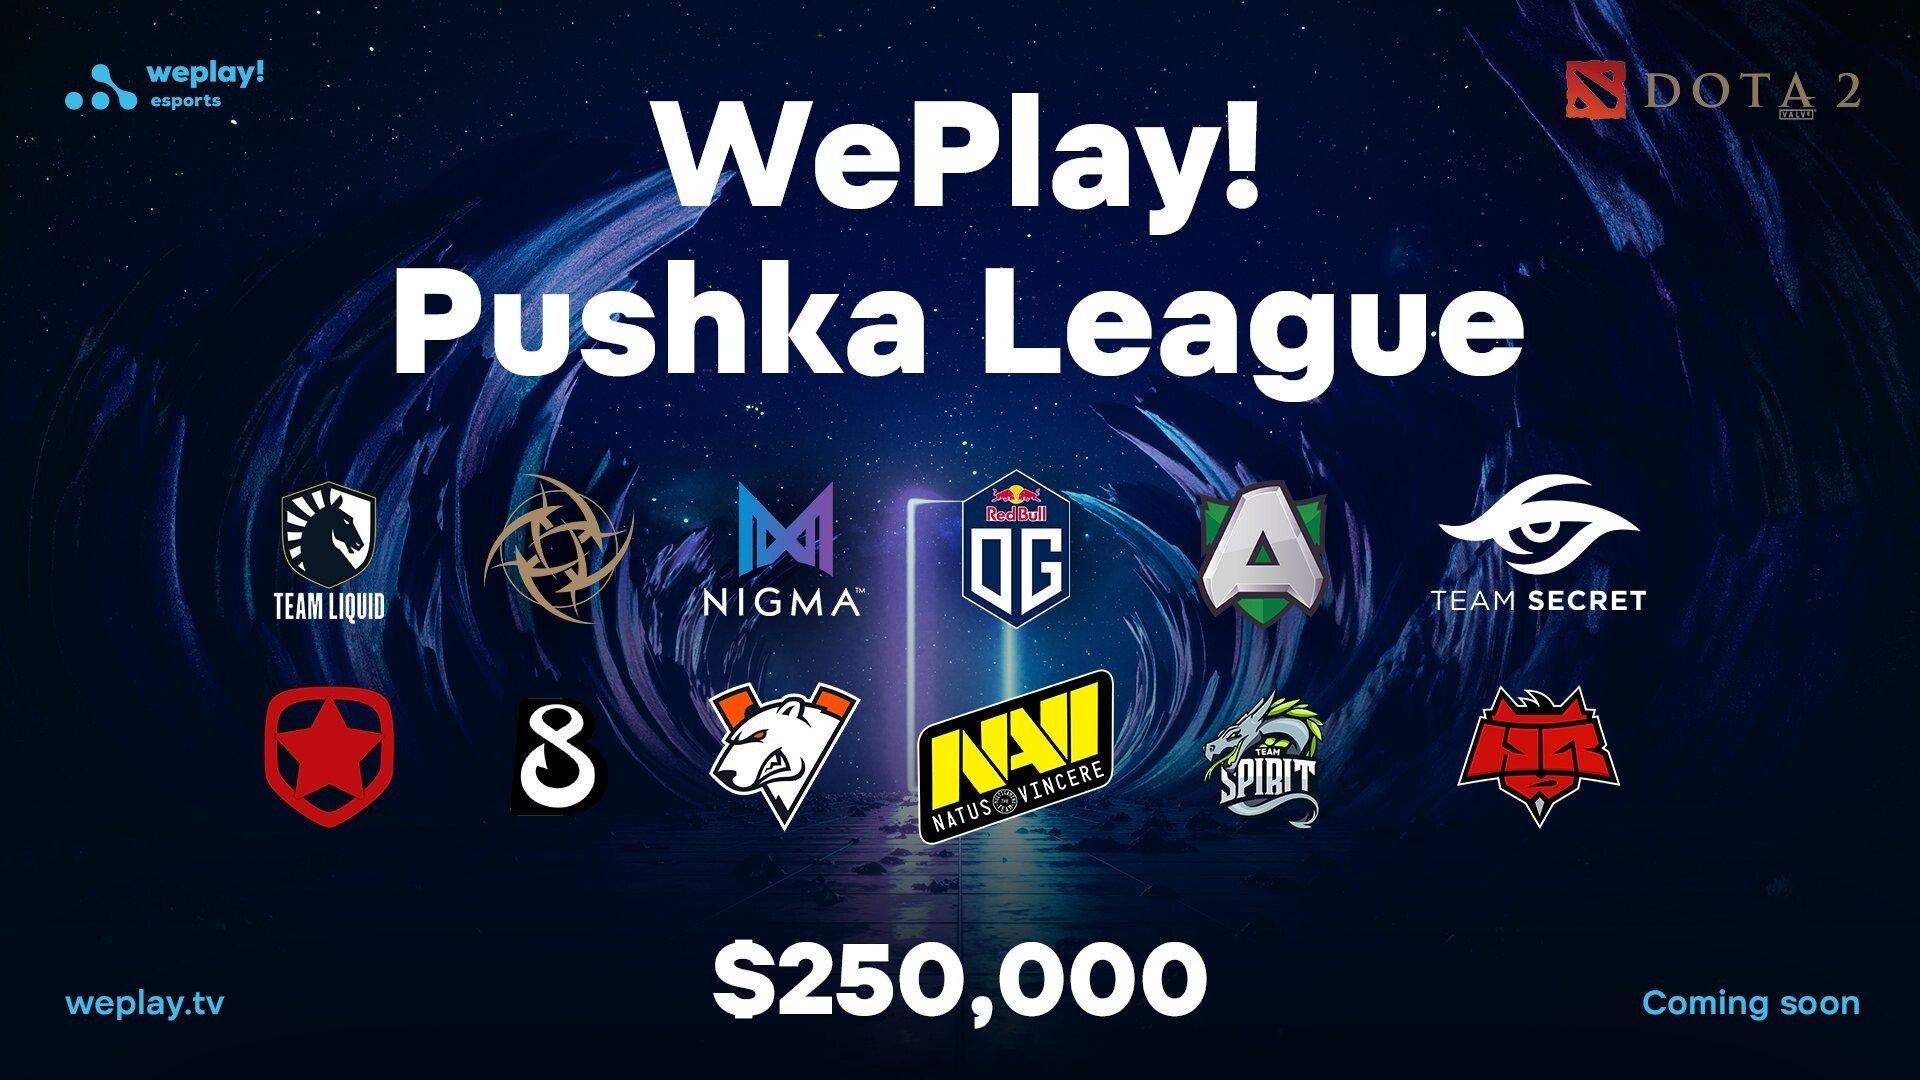 Dota 2 WePlay! Pushka League Day 1 Wrap Up